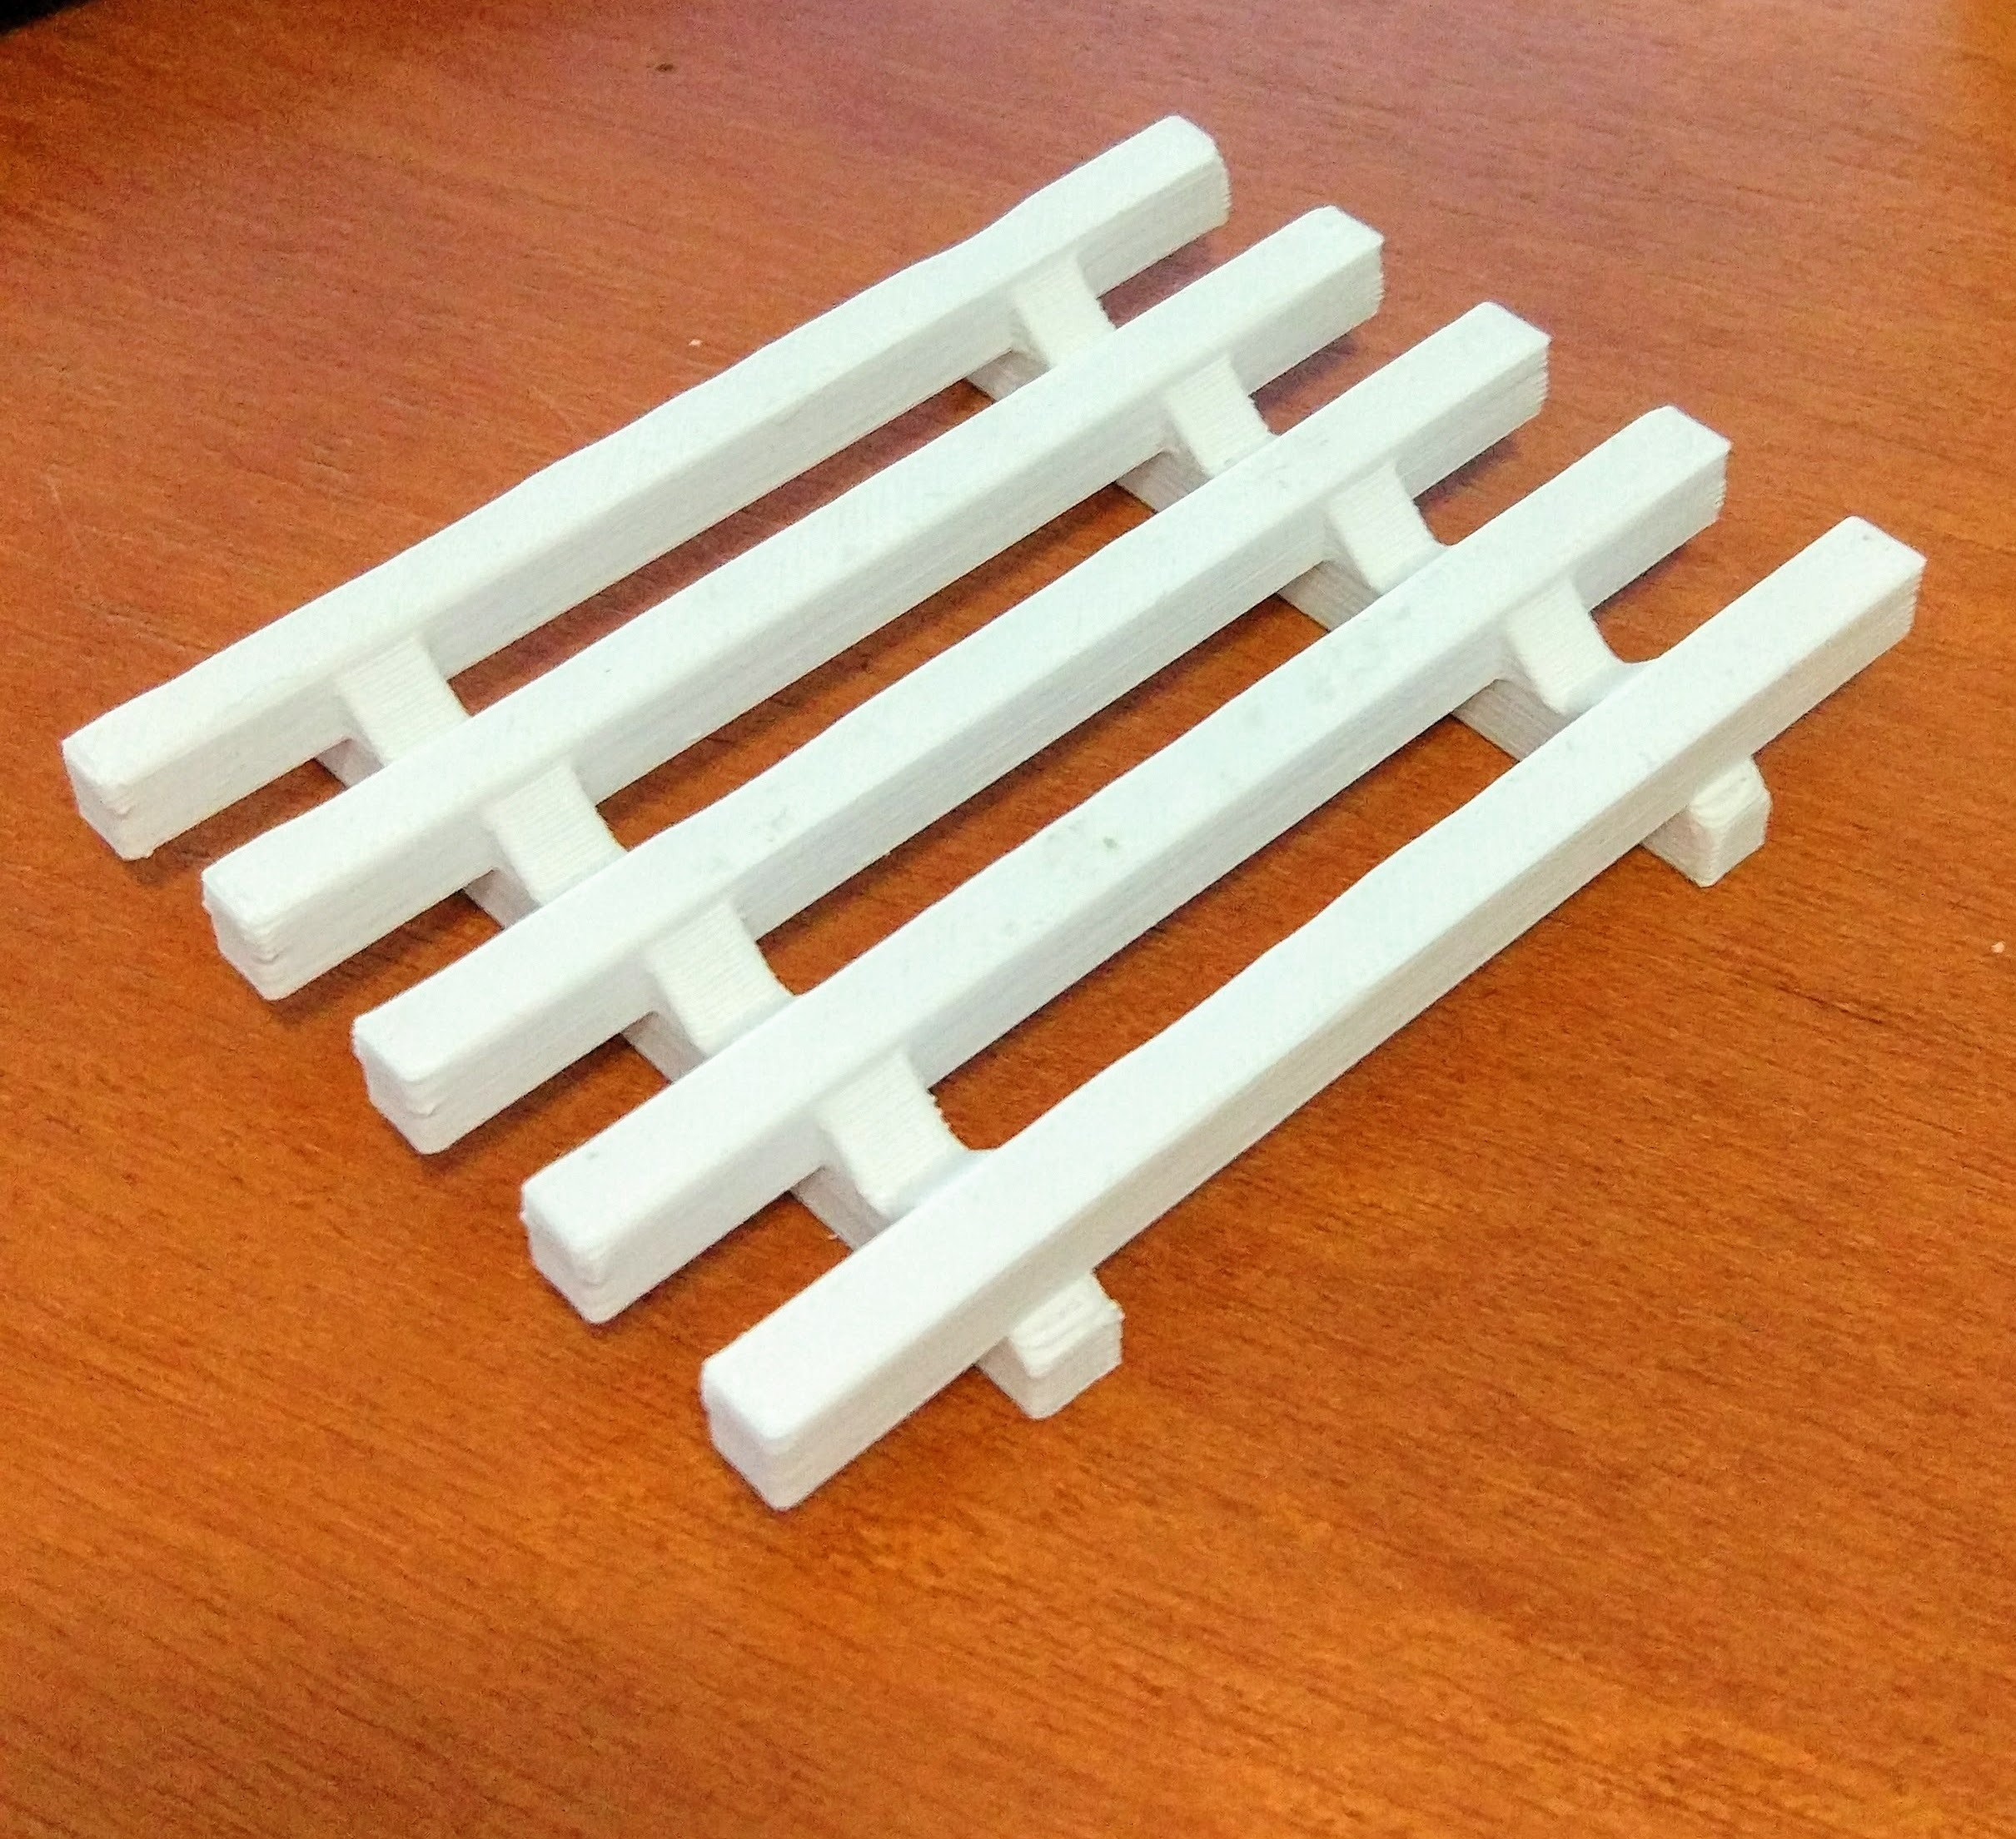 IMG_20161223_170834.jpg Download STL file Soap Saver • 3D printable design, Bitencourt